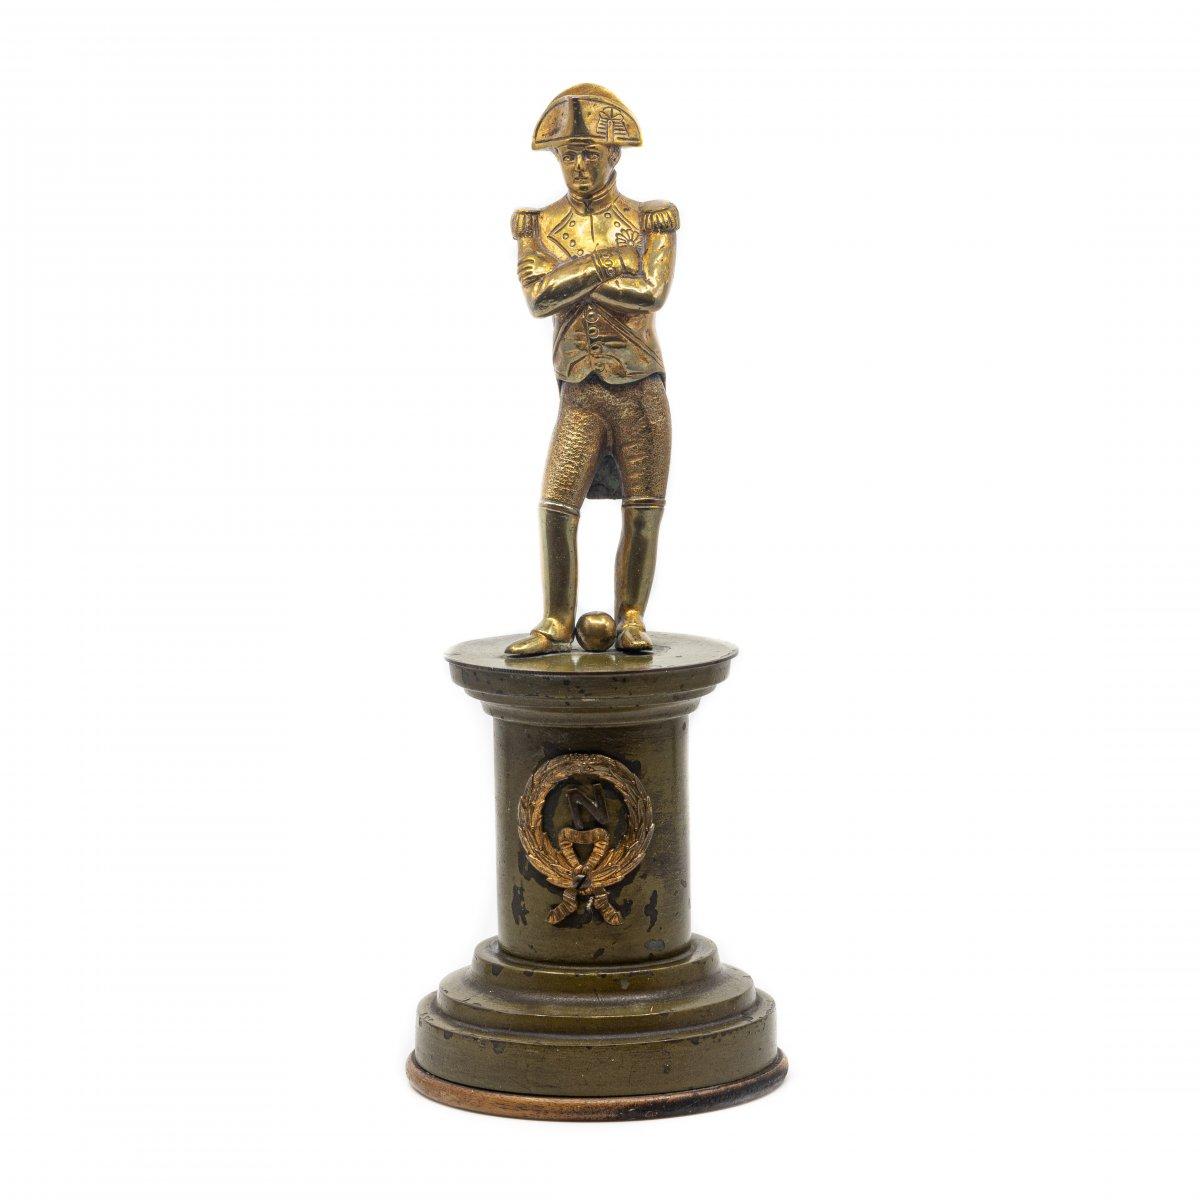 Napoleon Golden Brass Statuette - France, Mid 19th Century